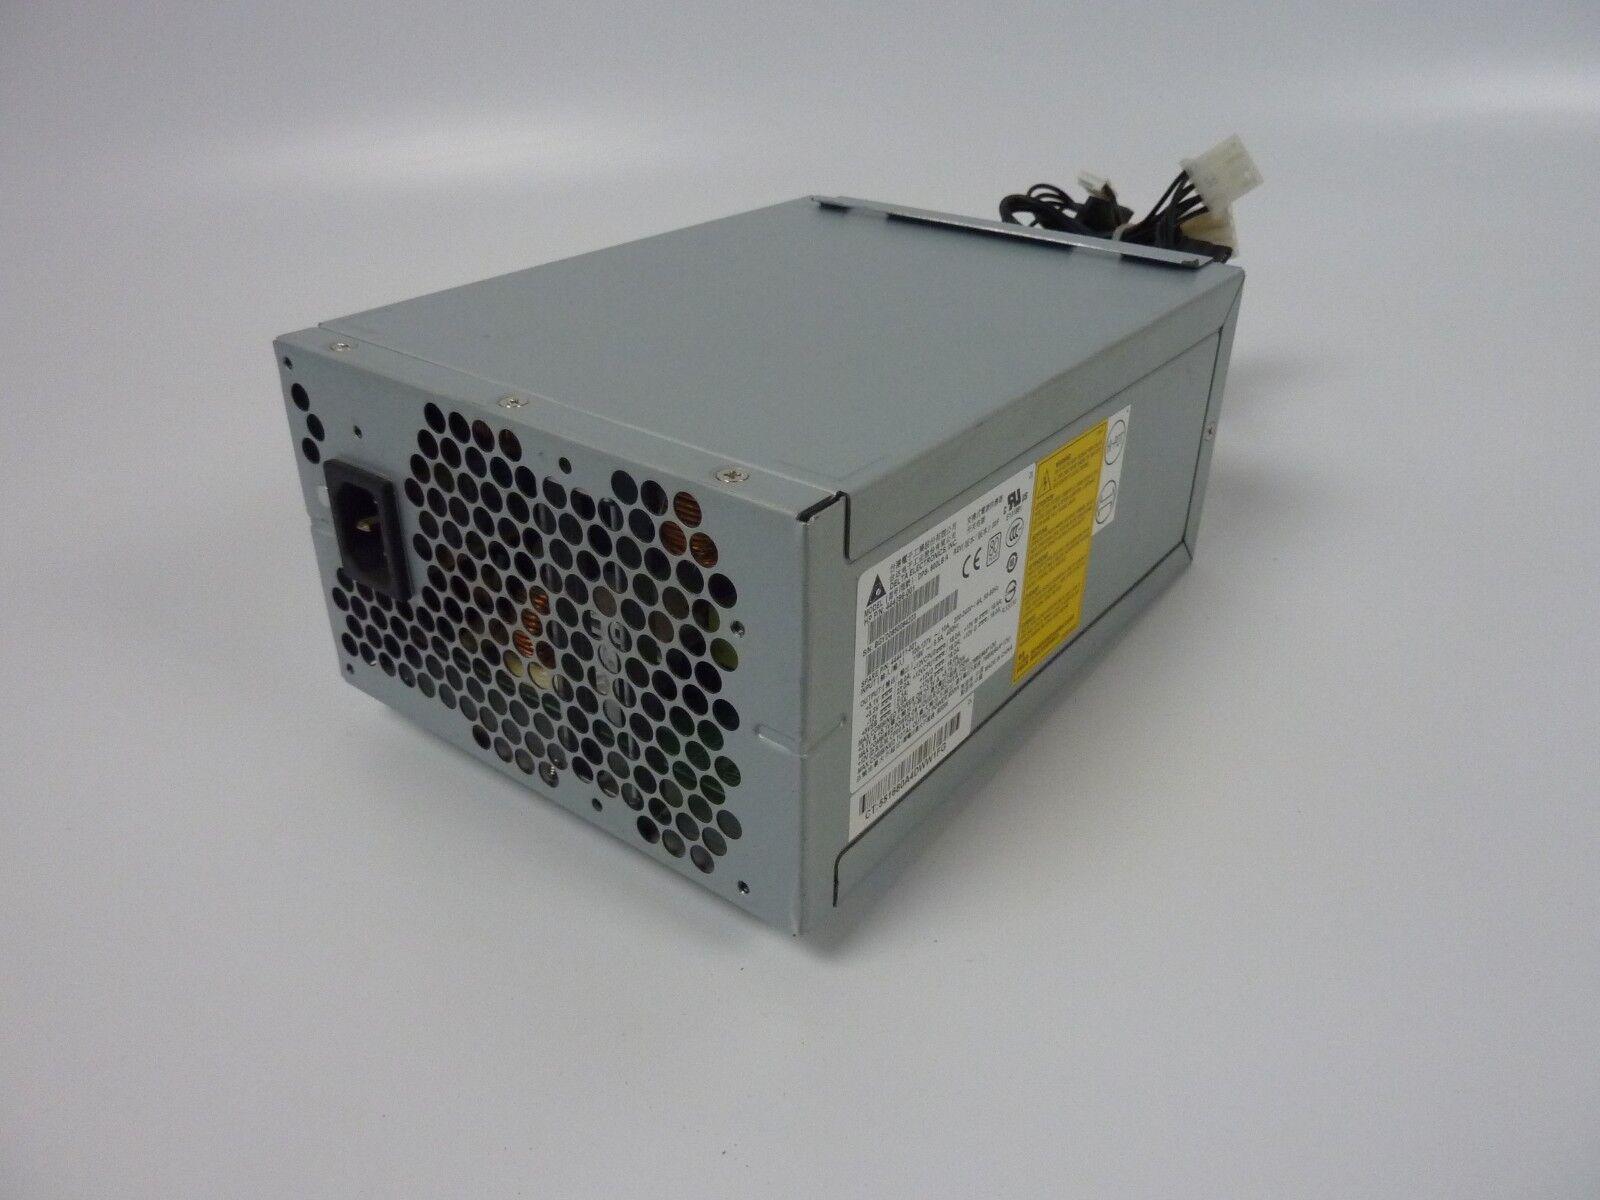 HP Power Supply 440860-001 442038-001 DPS-1050CB for XW8600 XW9400 Workstation